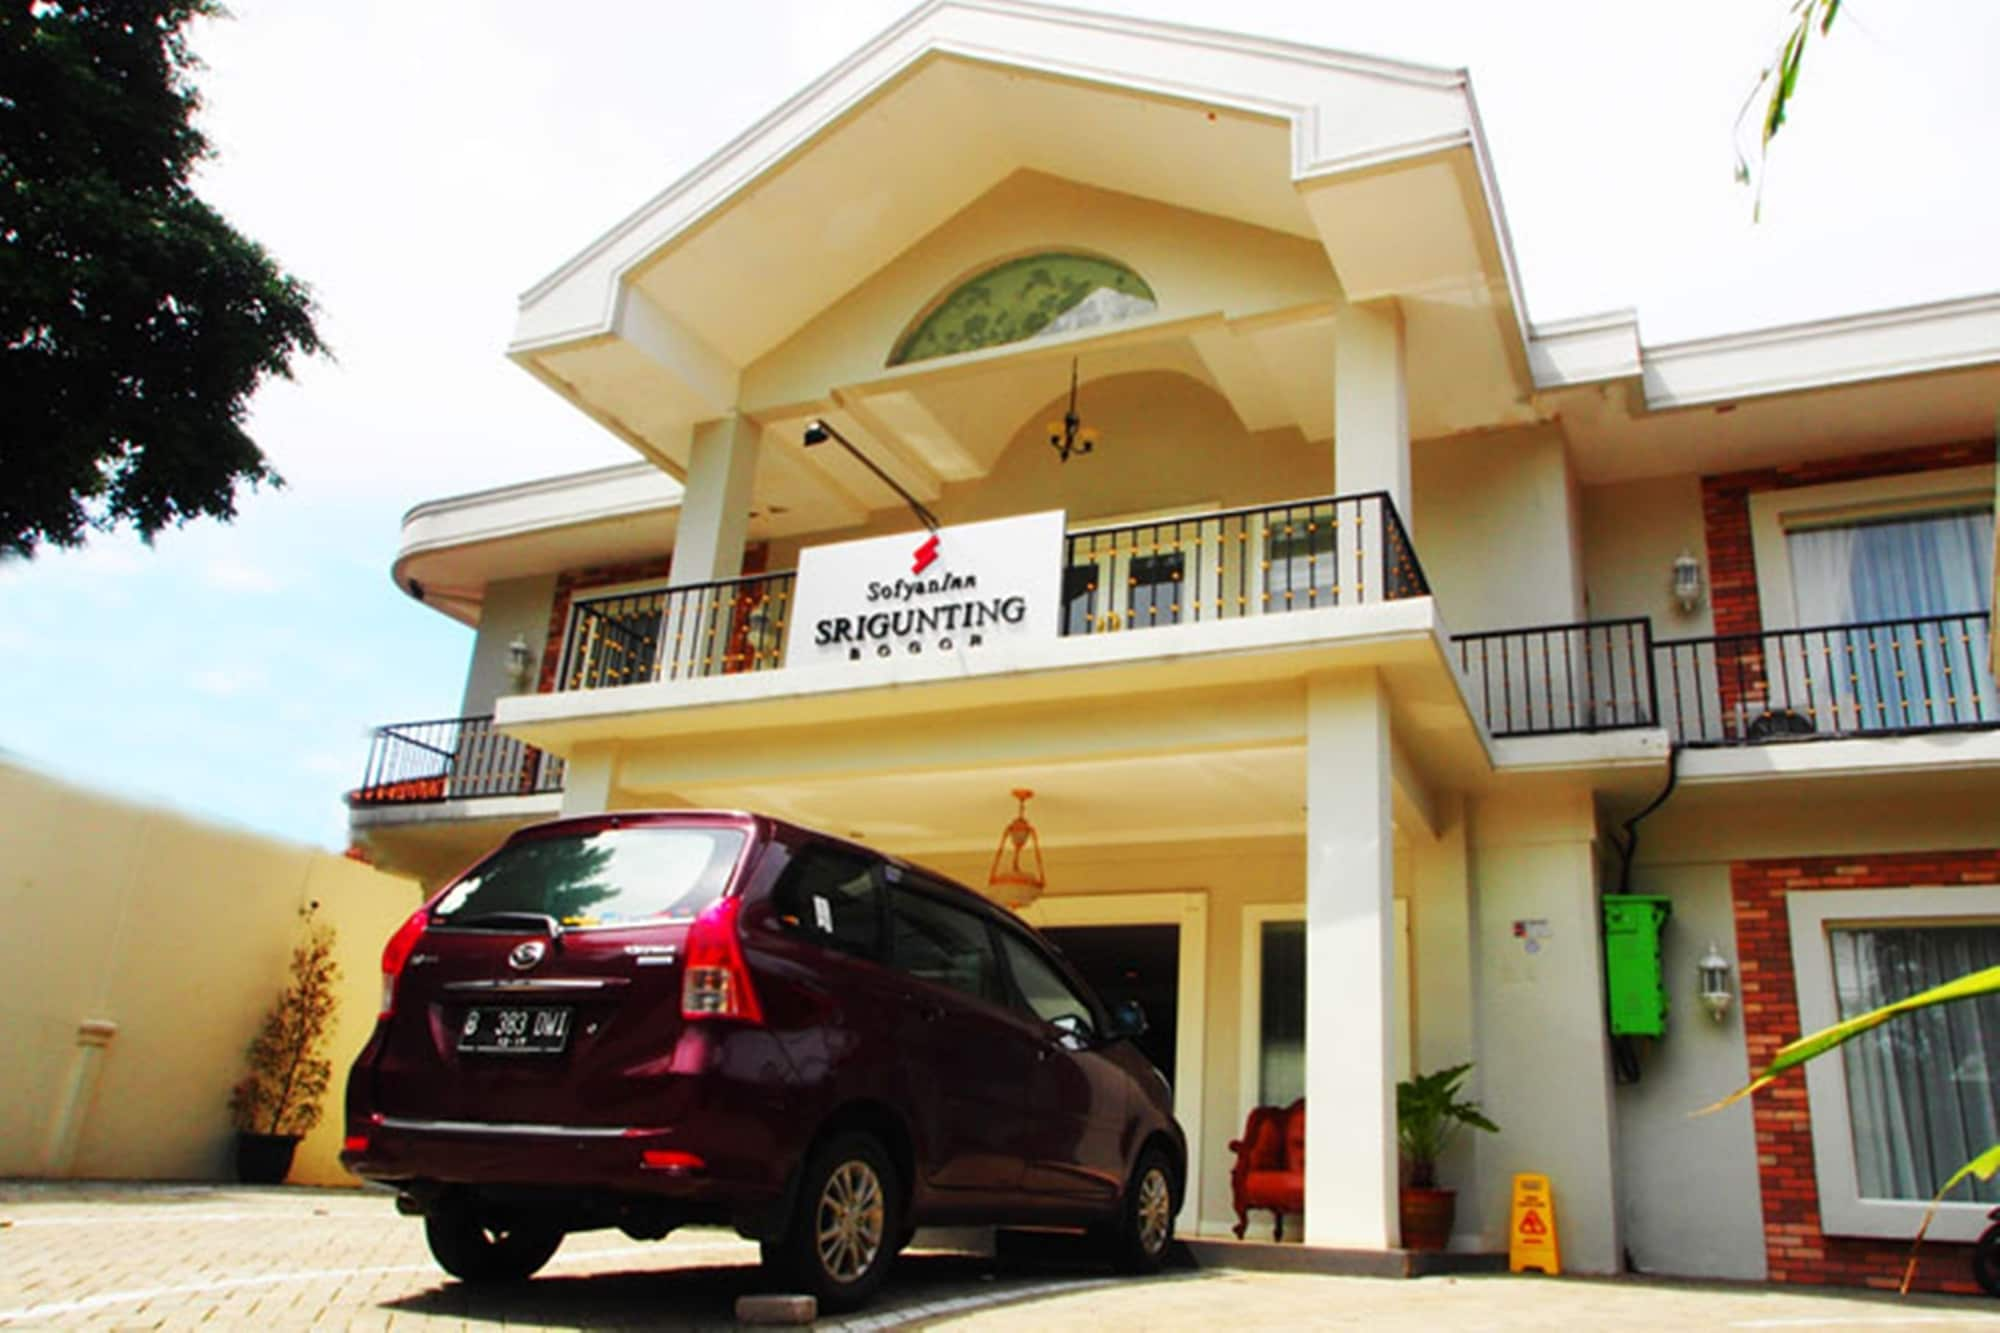 Sofyan Inn Srigunting - Halal Hotel, Bogor